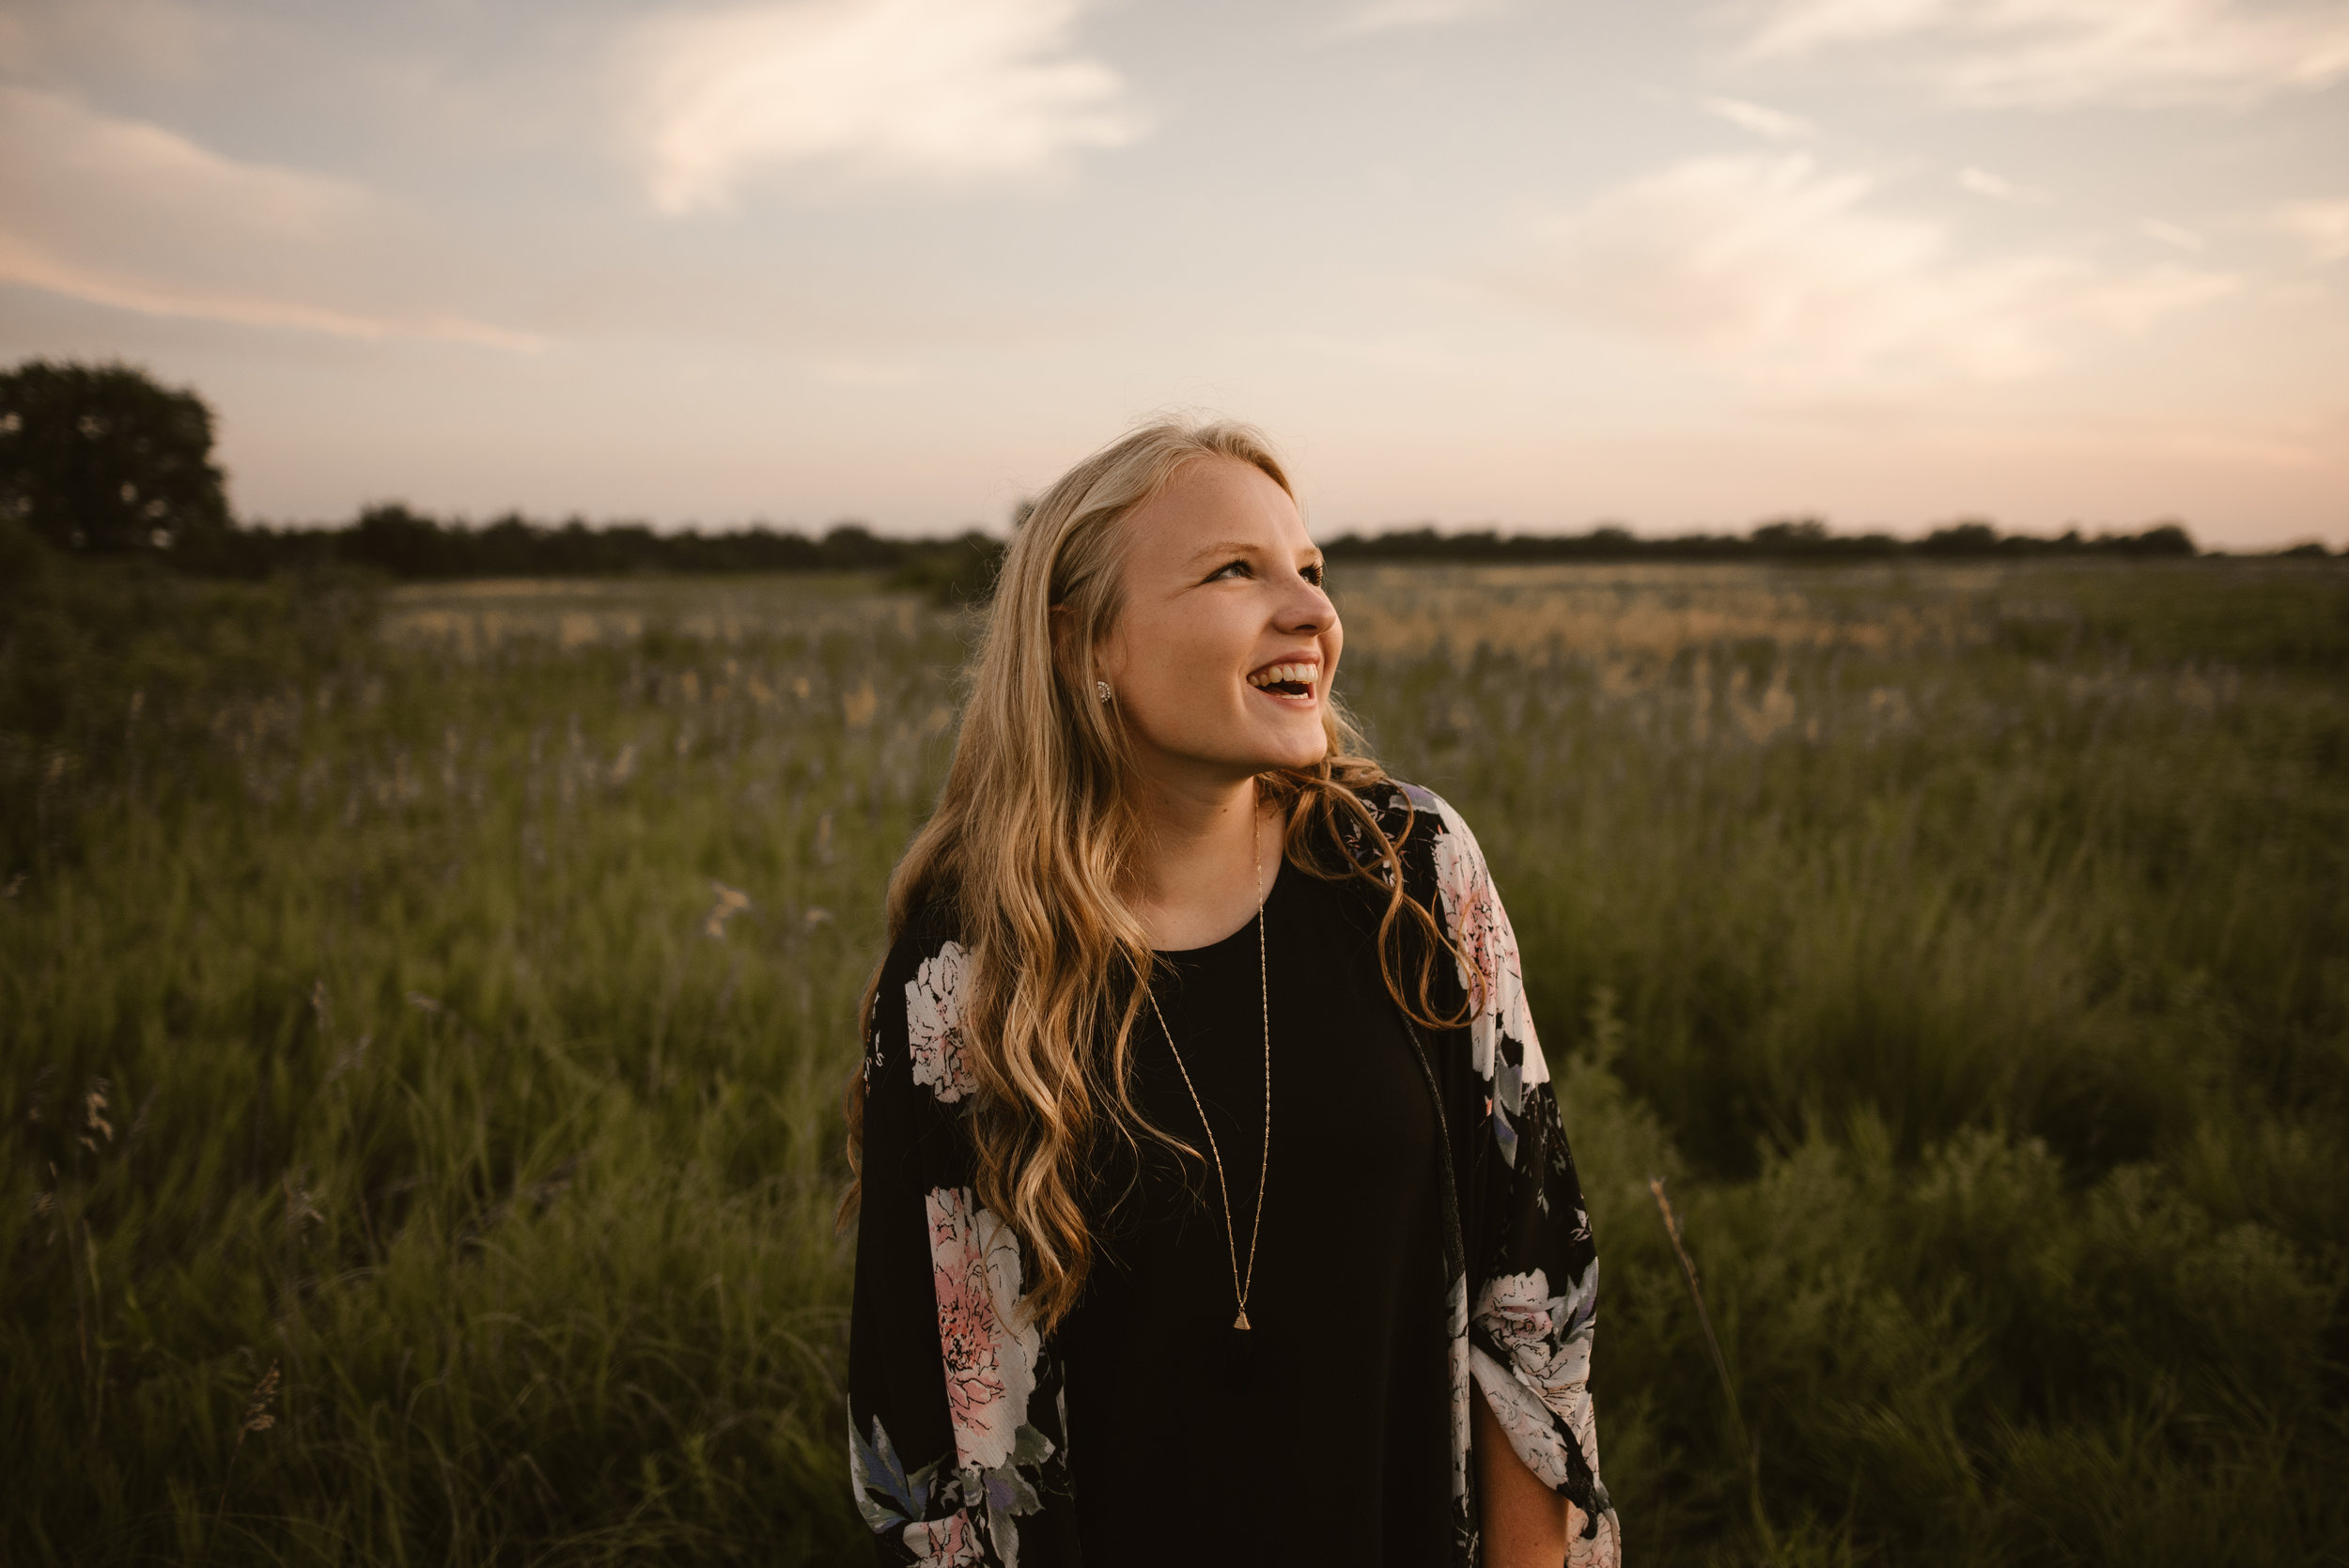 Kaylie-Sirek-Photography-Grand-Island-Nebraska-Senior-021.jpg